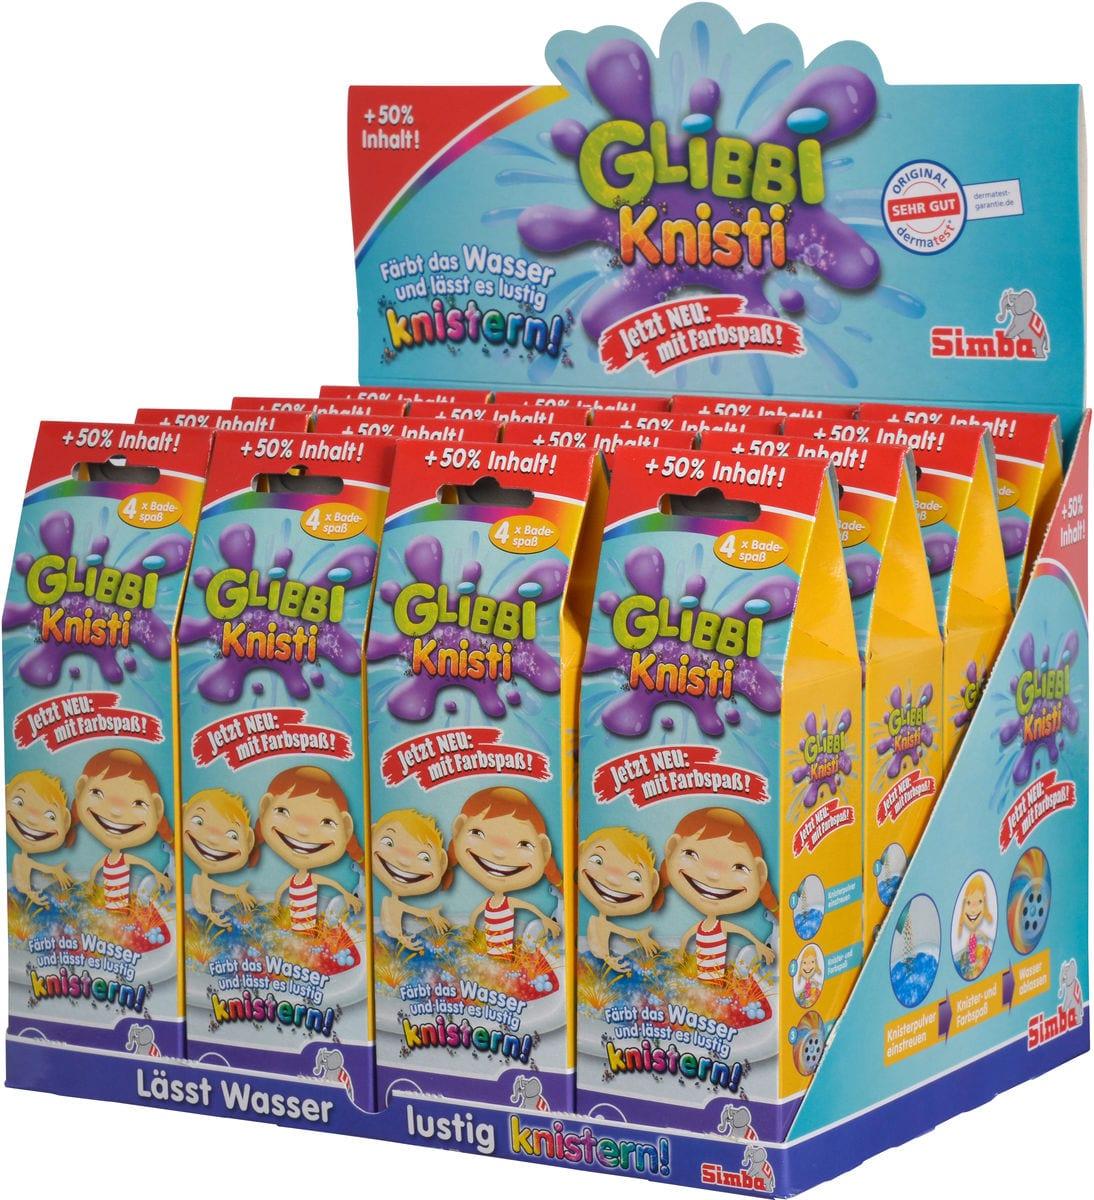 Simba Glibibi Knisti 1 Pack Modelieren